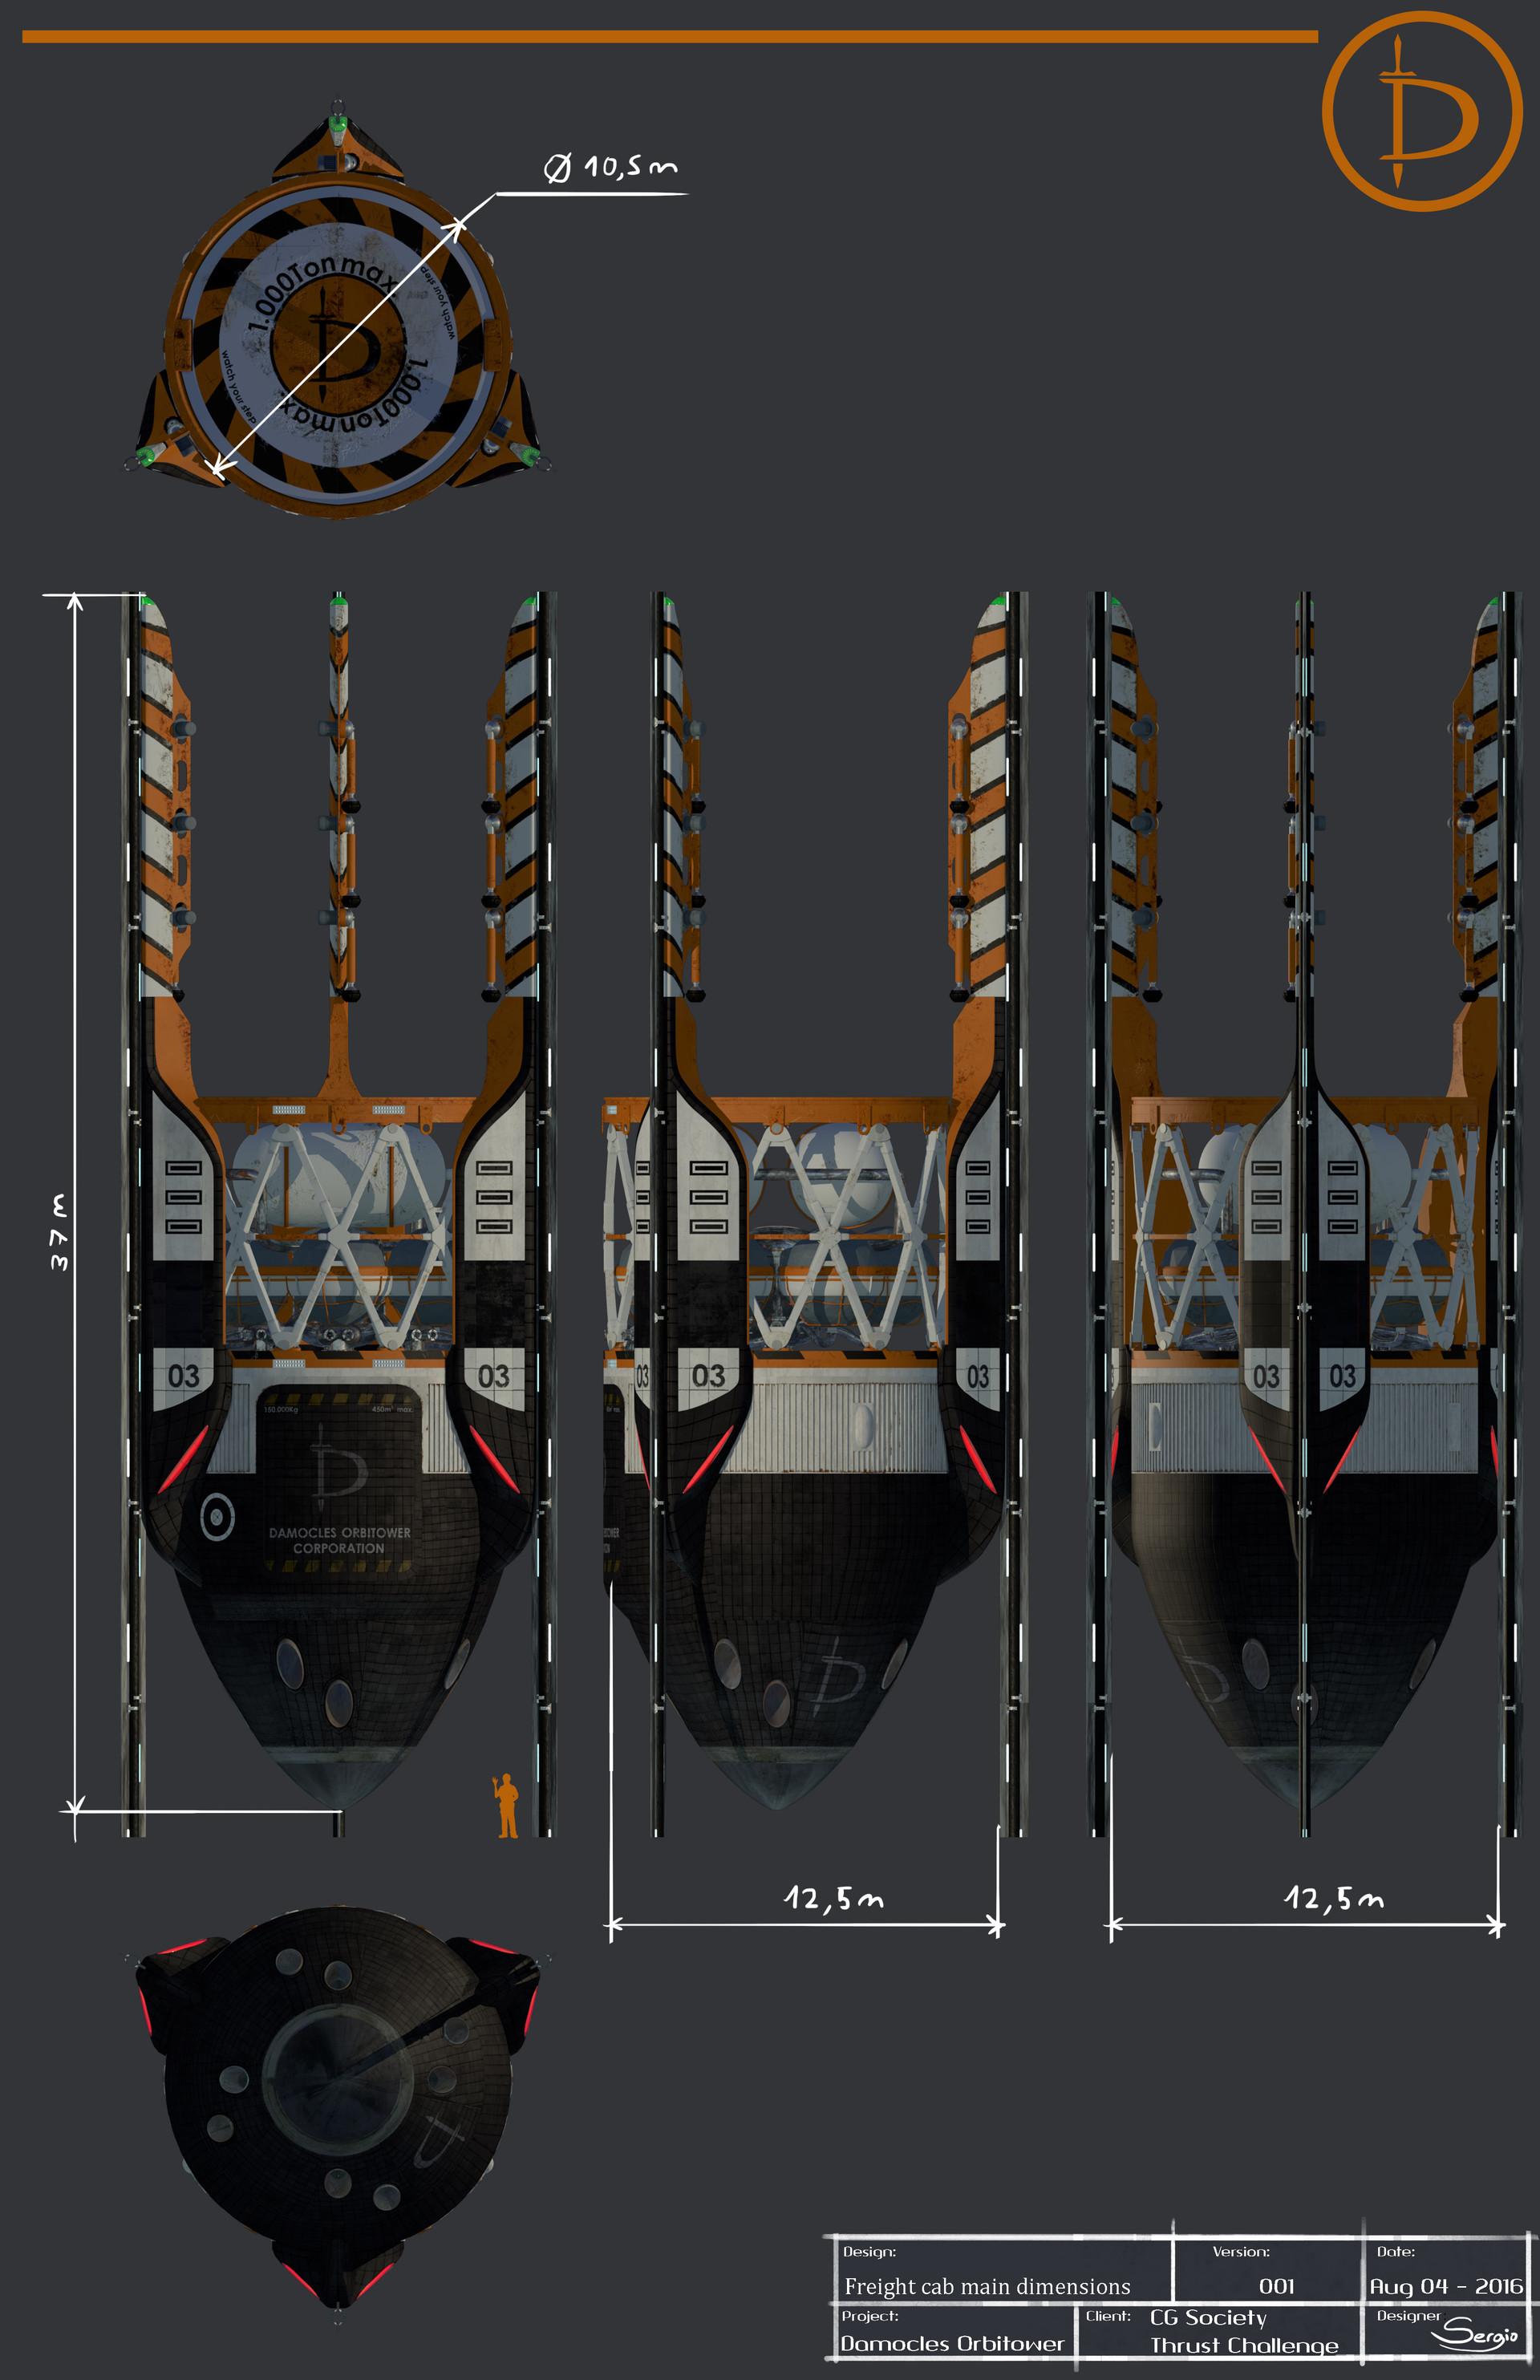 sergio-botero-tflp-damocles-presentation-freight-cab-dims.jpg